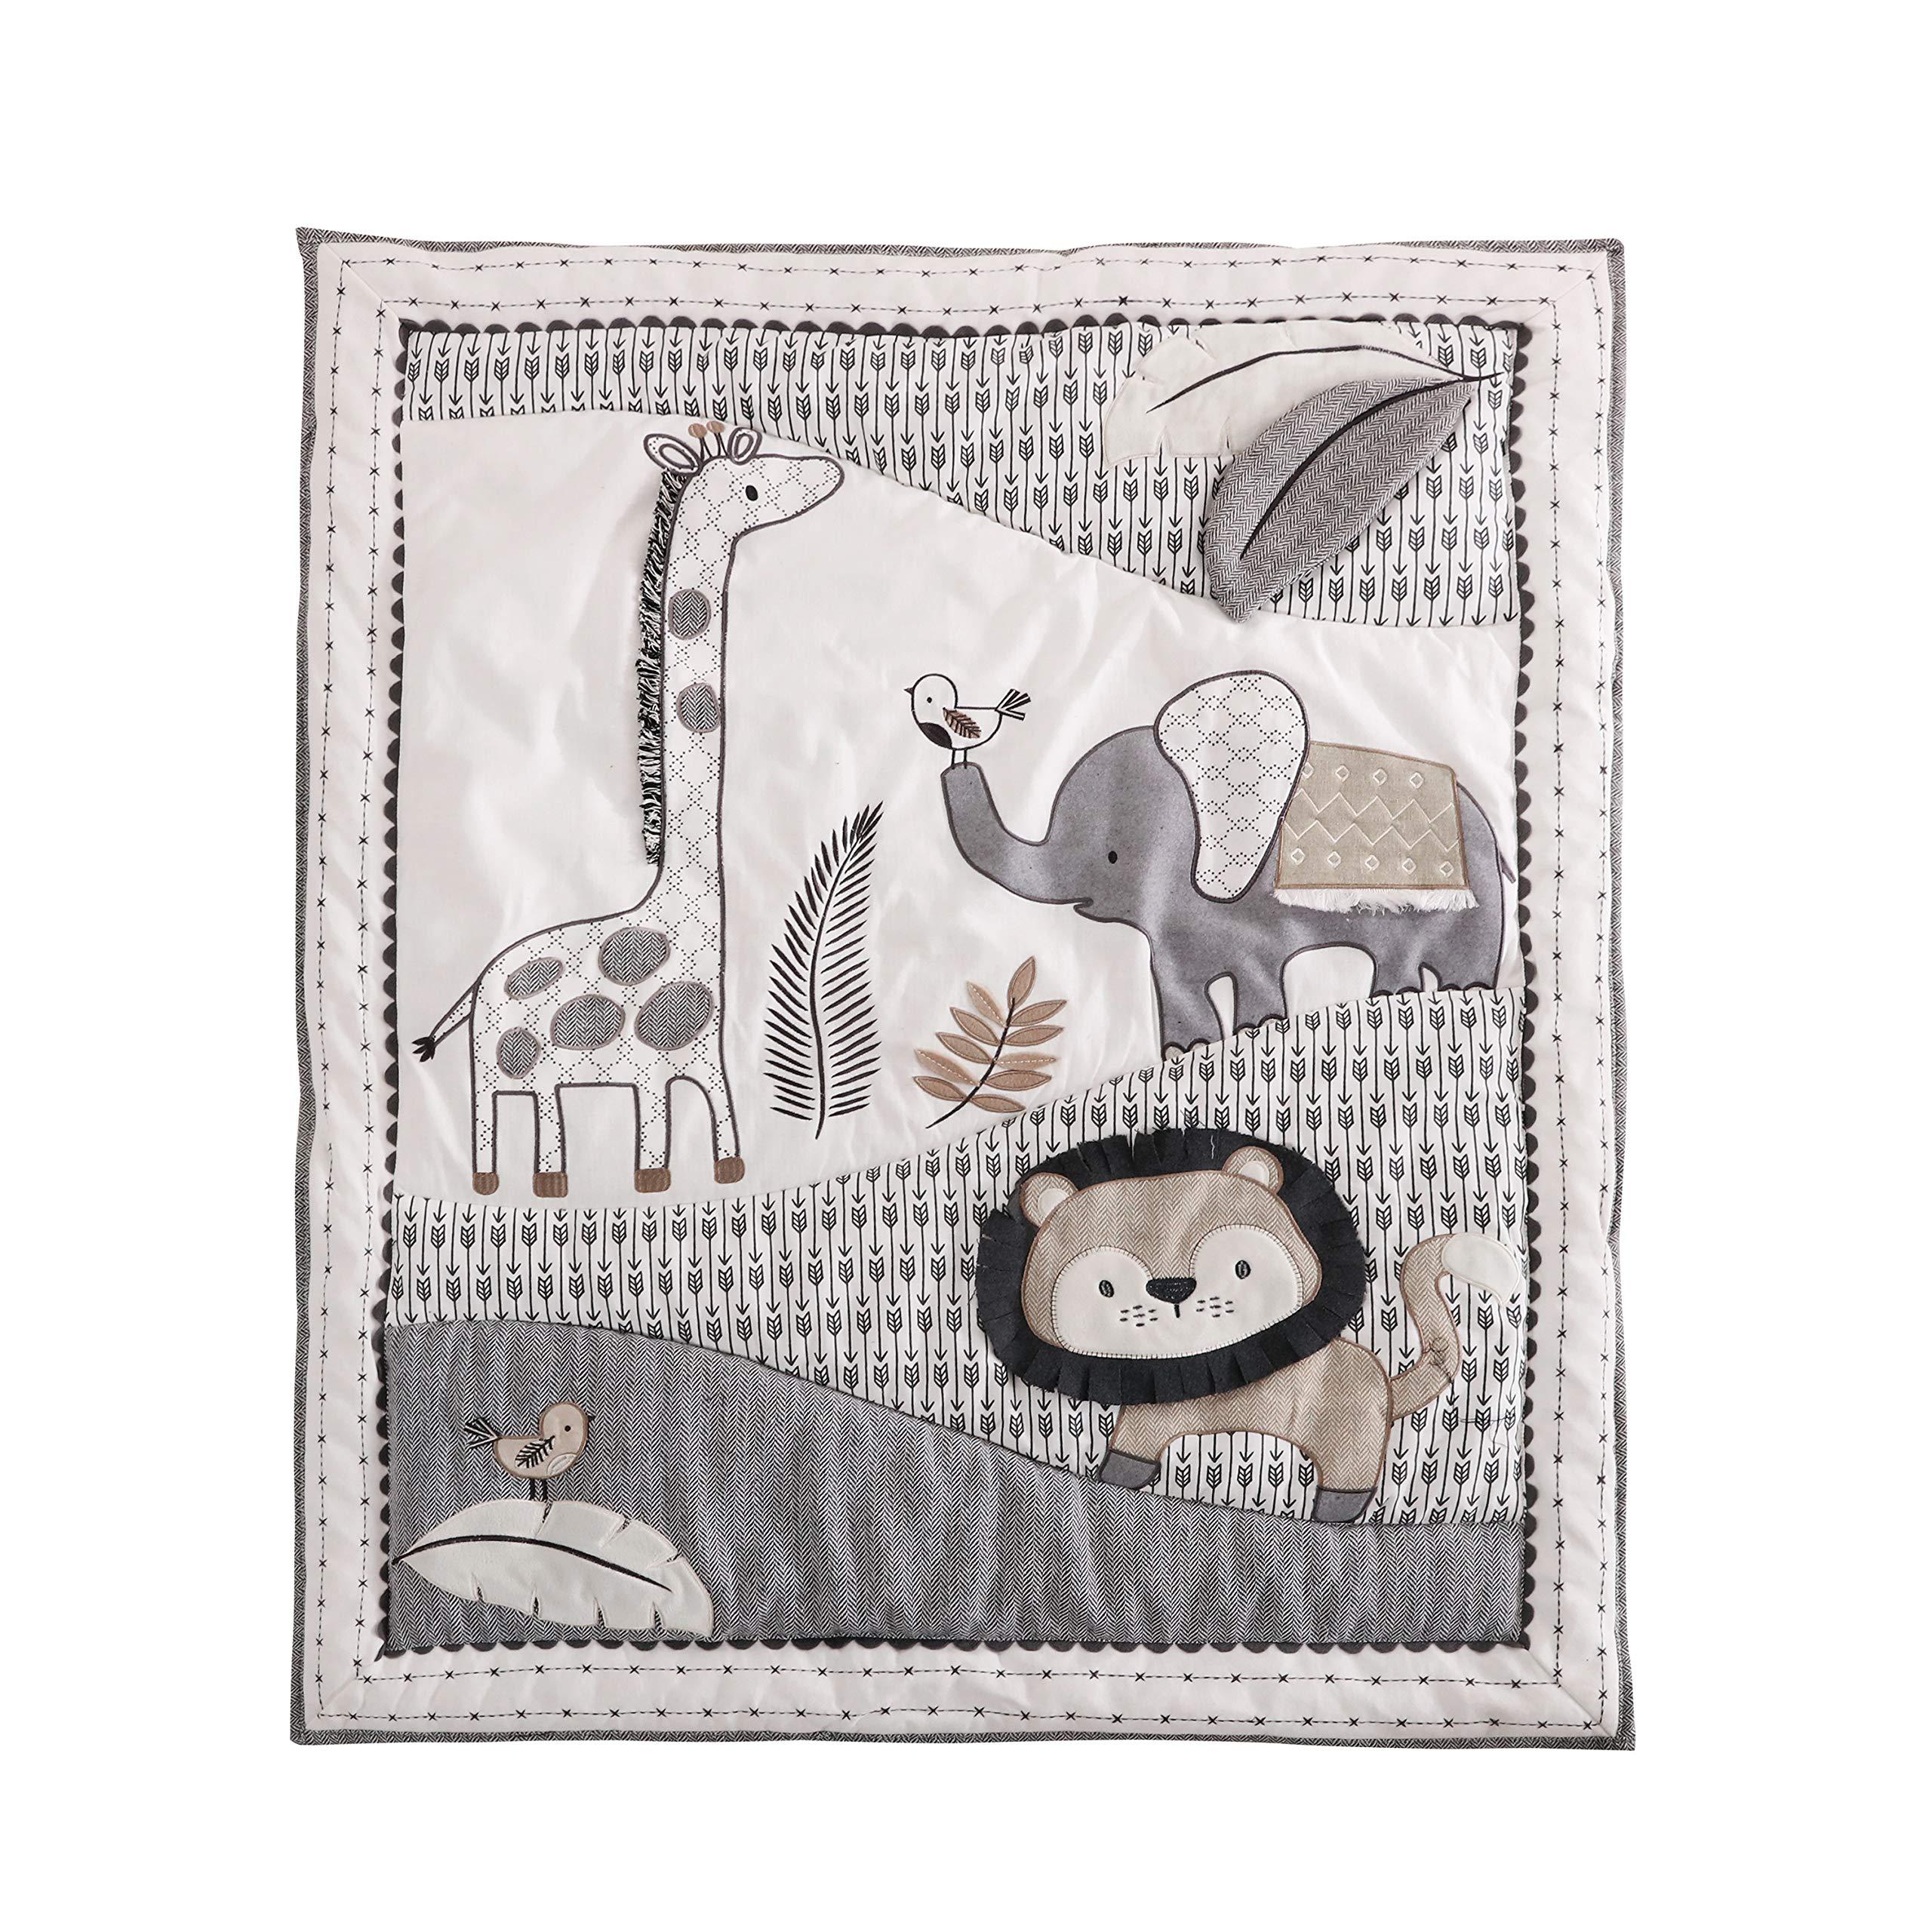 Levtex Baby Tanzania Neutral 5-Piece Crib Bedding Set, Grey/Black/Cream/Tan by Levtex (Image #2)